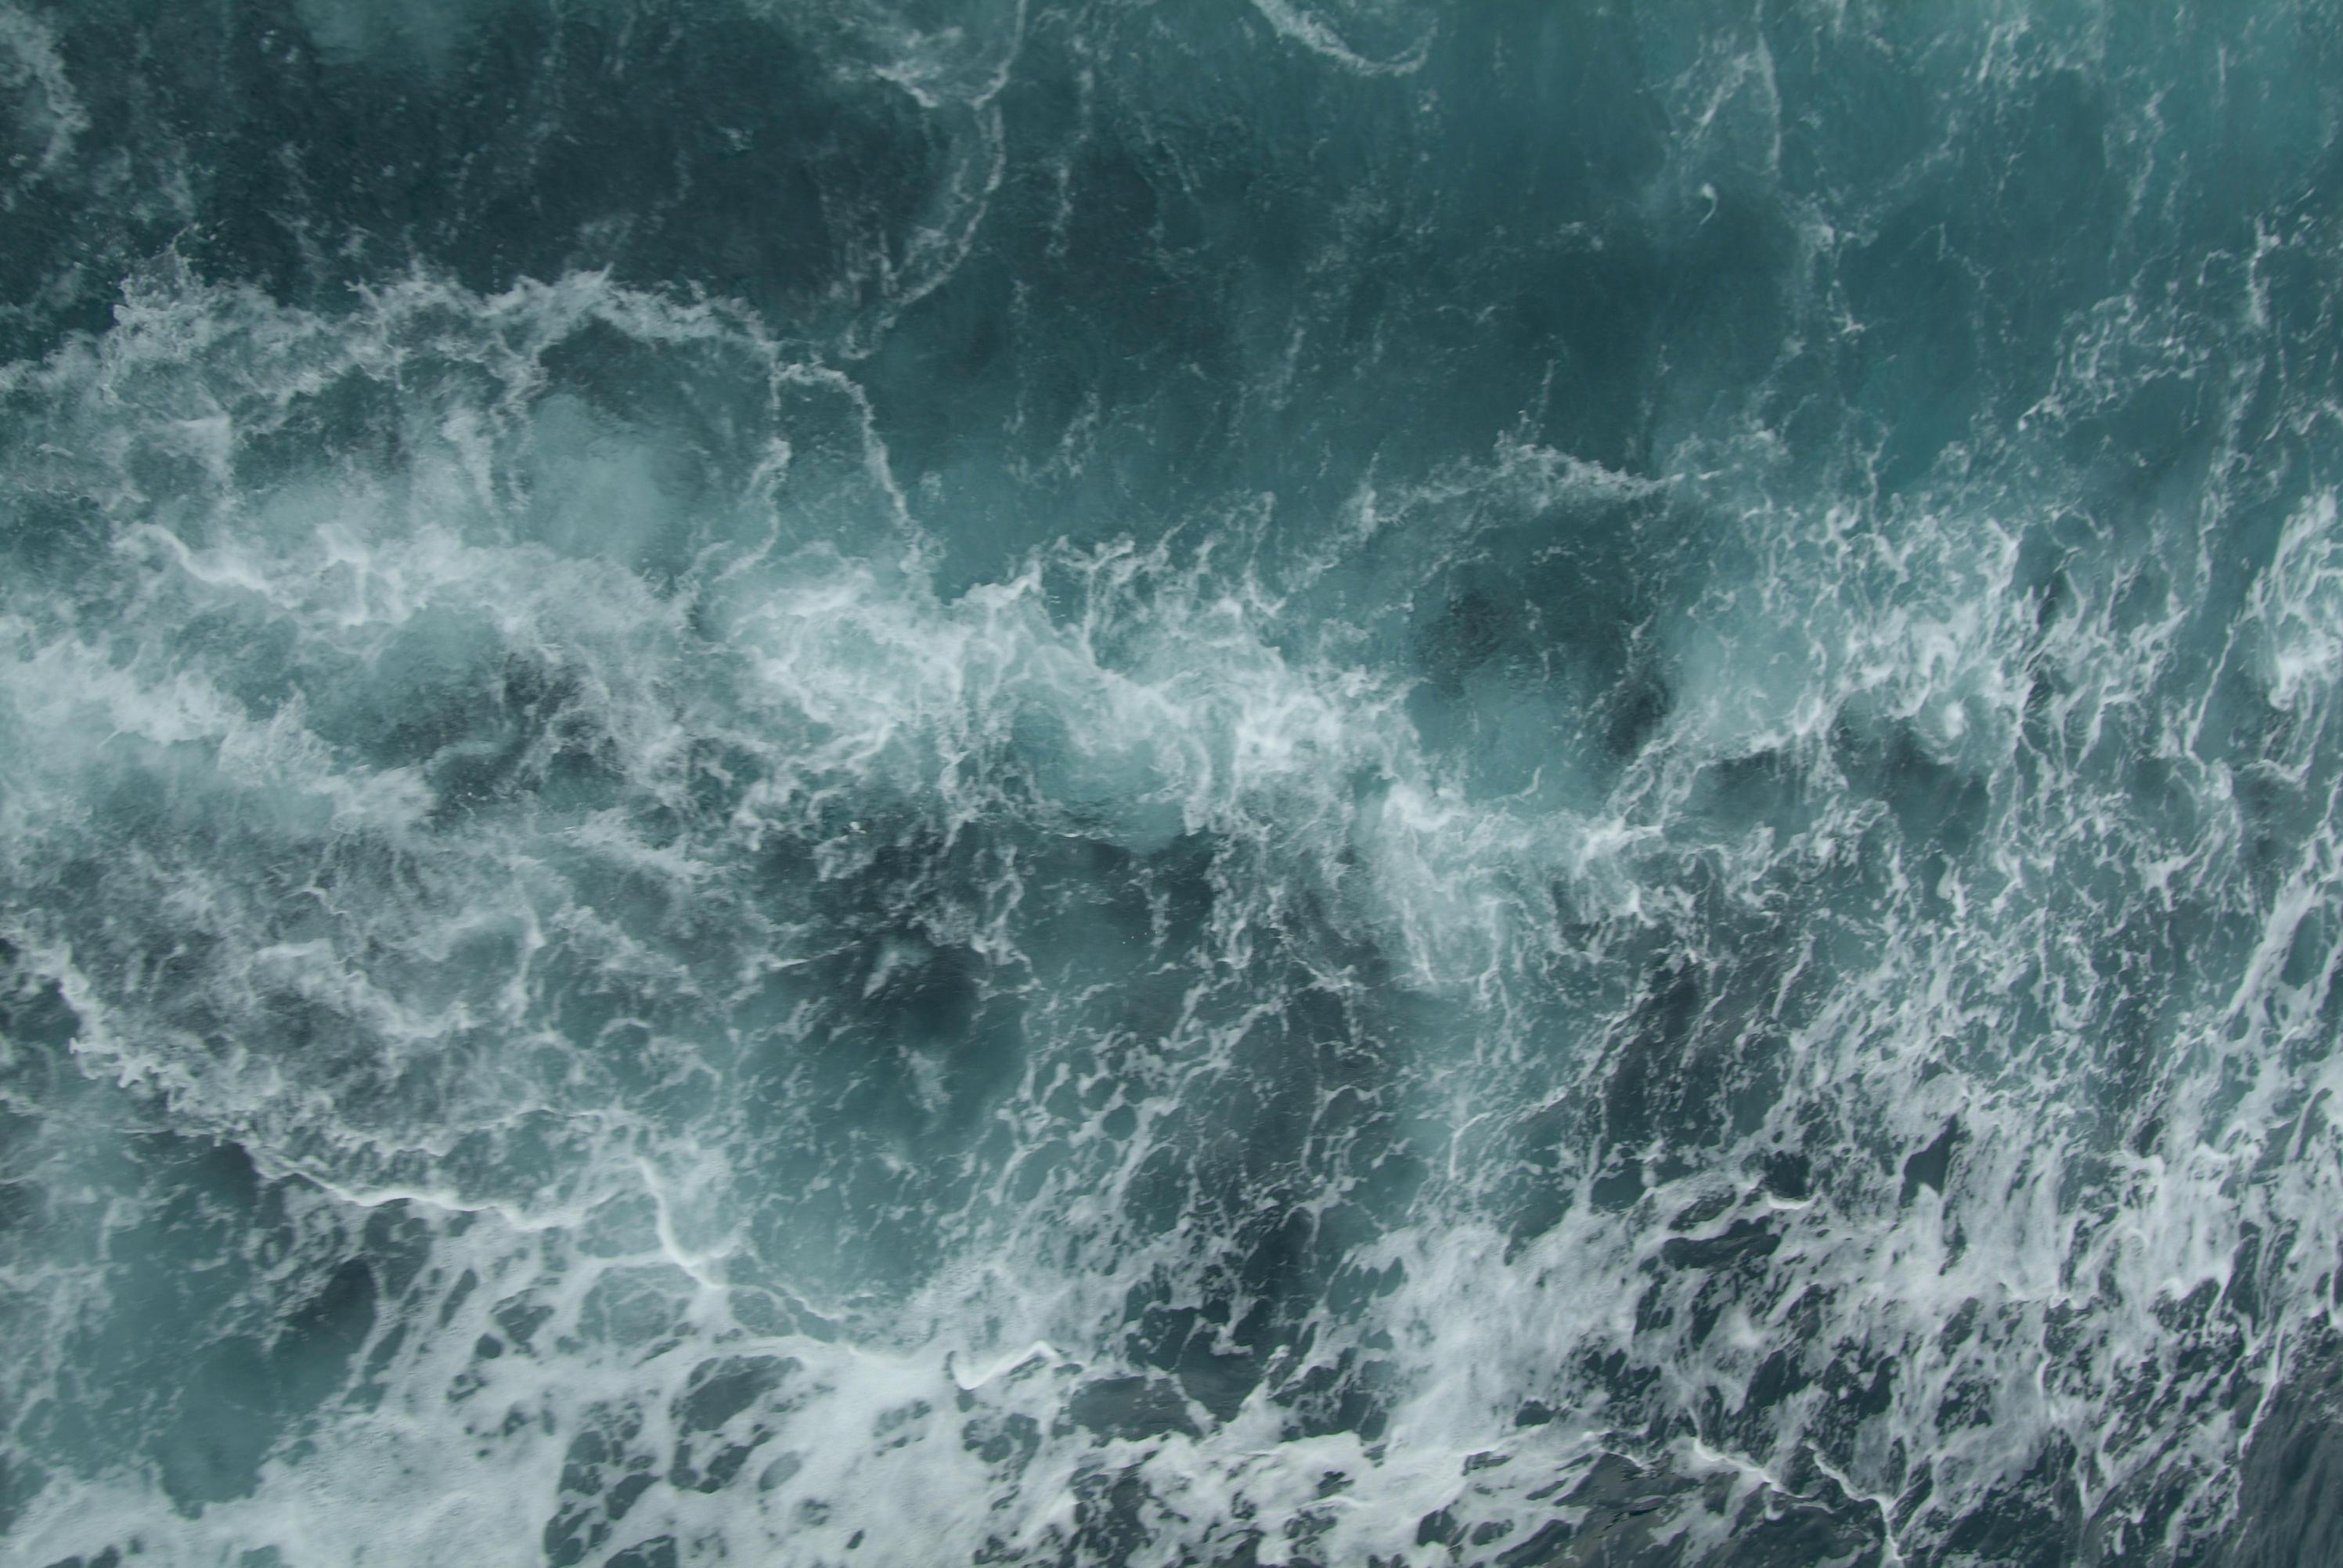 Turbulent Water By Mjranum-stock On DeviantArt